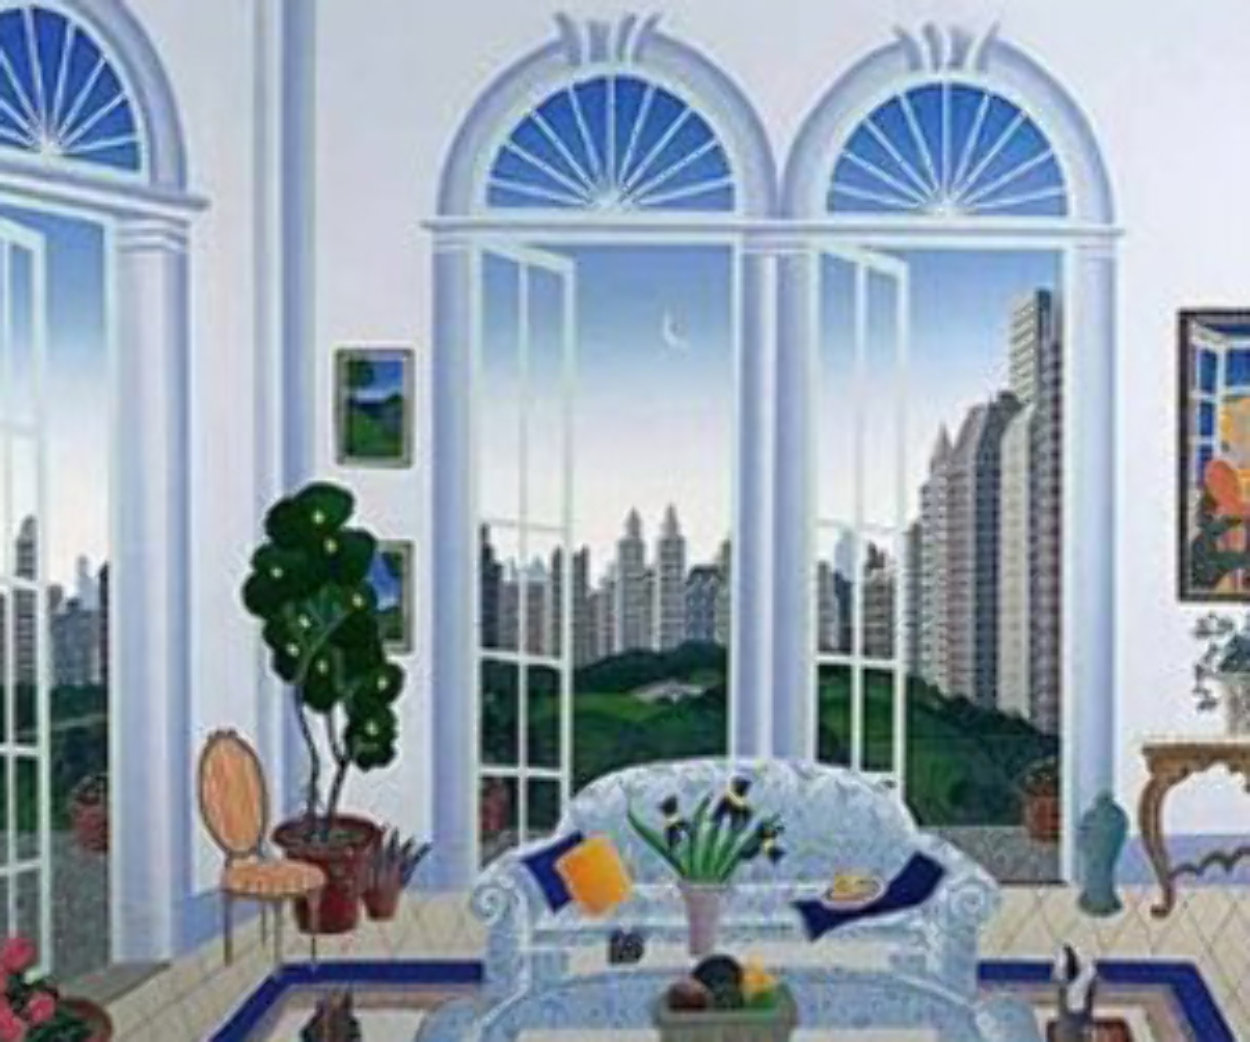 Columbus Circle New York 1998 Limited Edition Print by Thomas Frederick McKnight